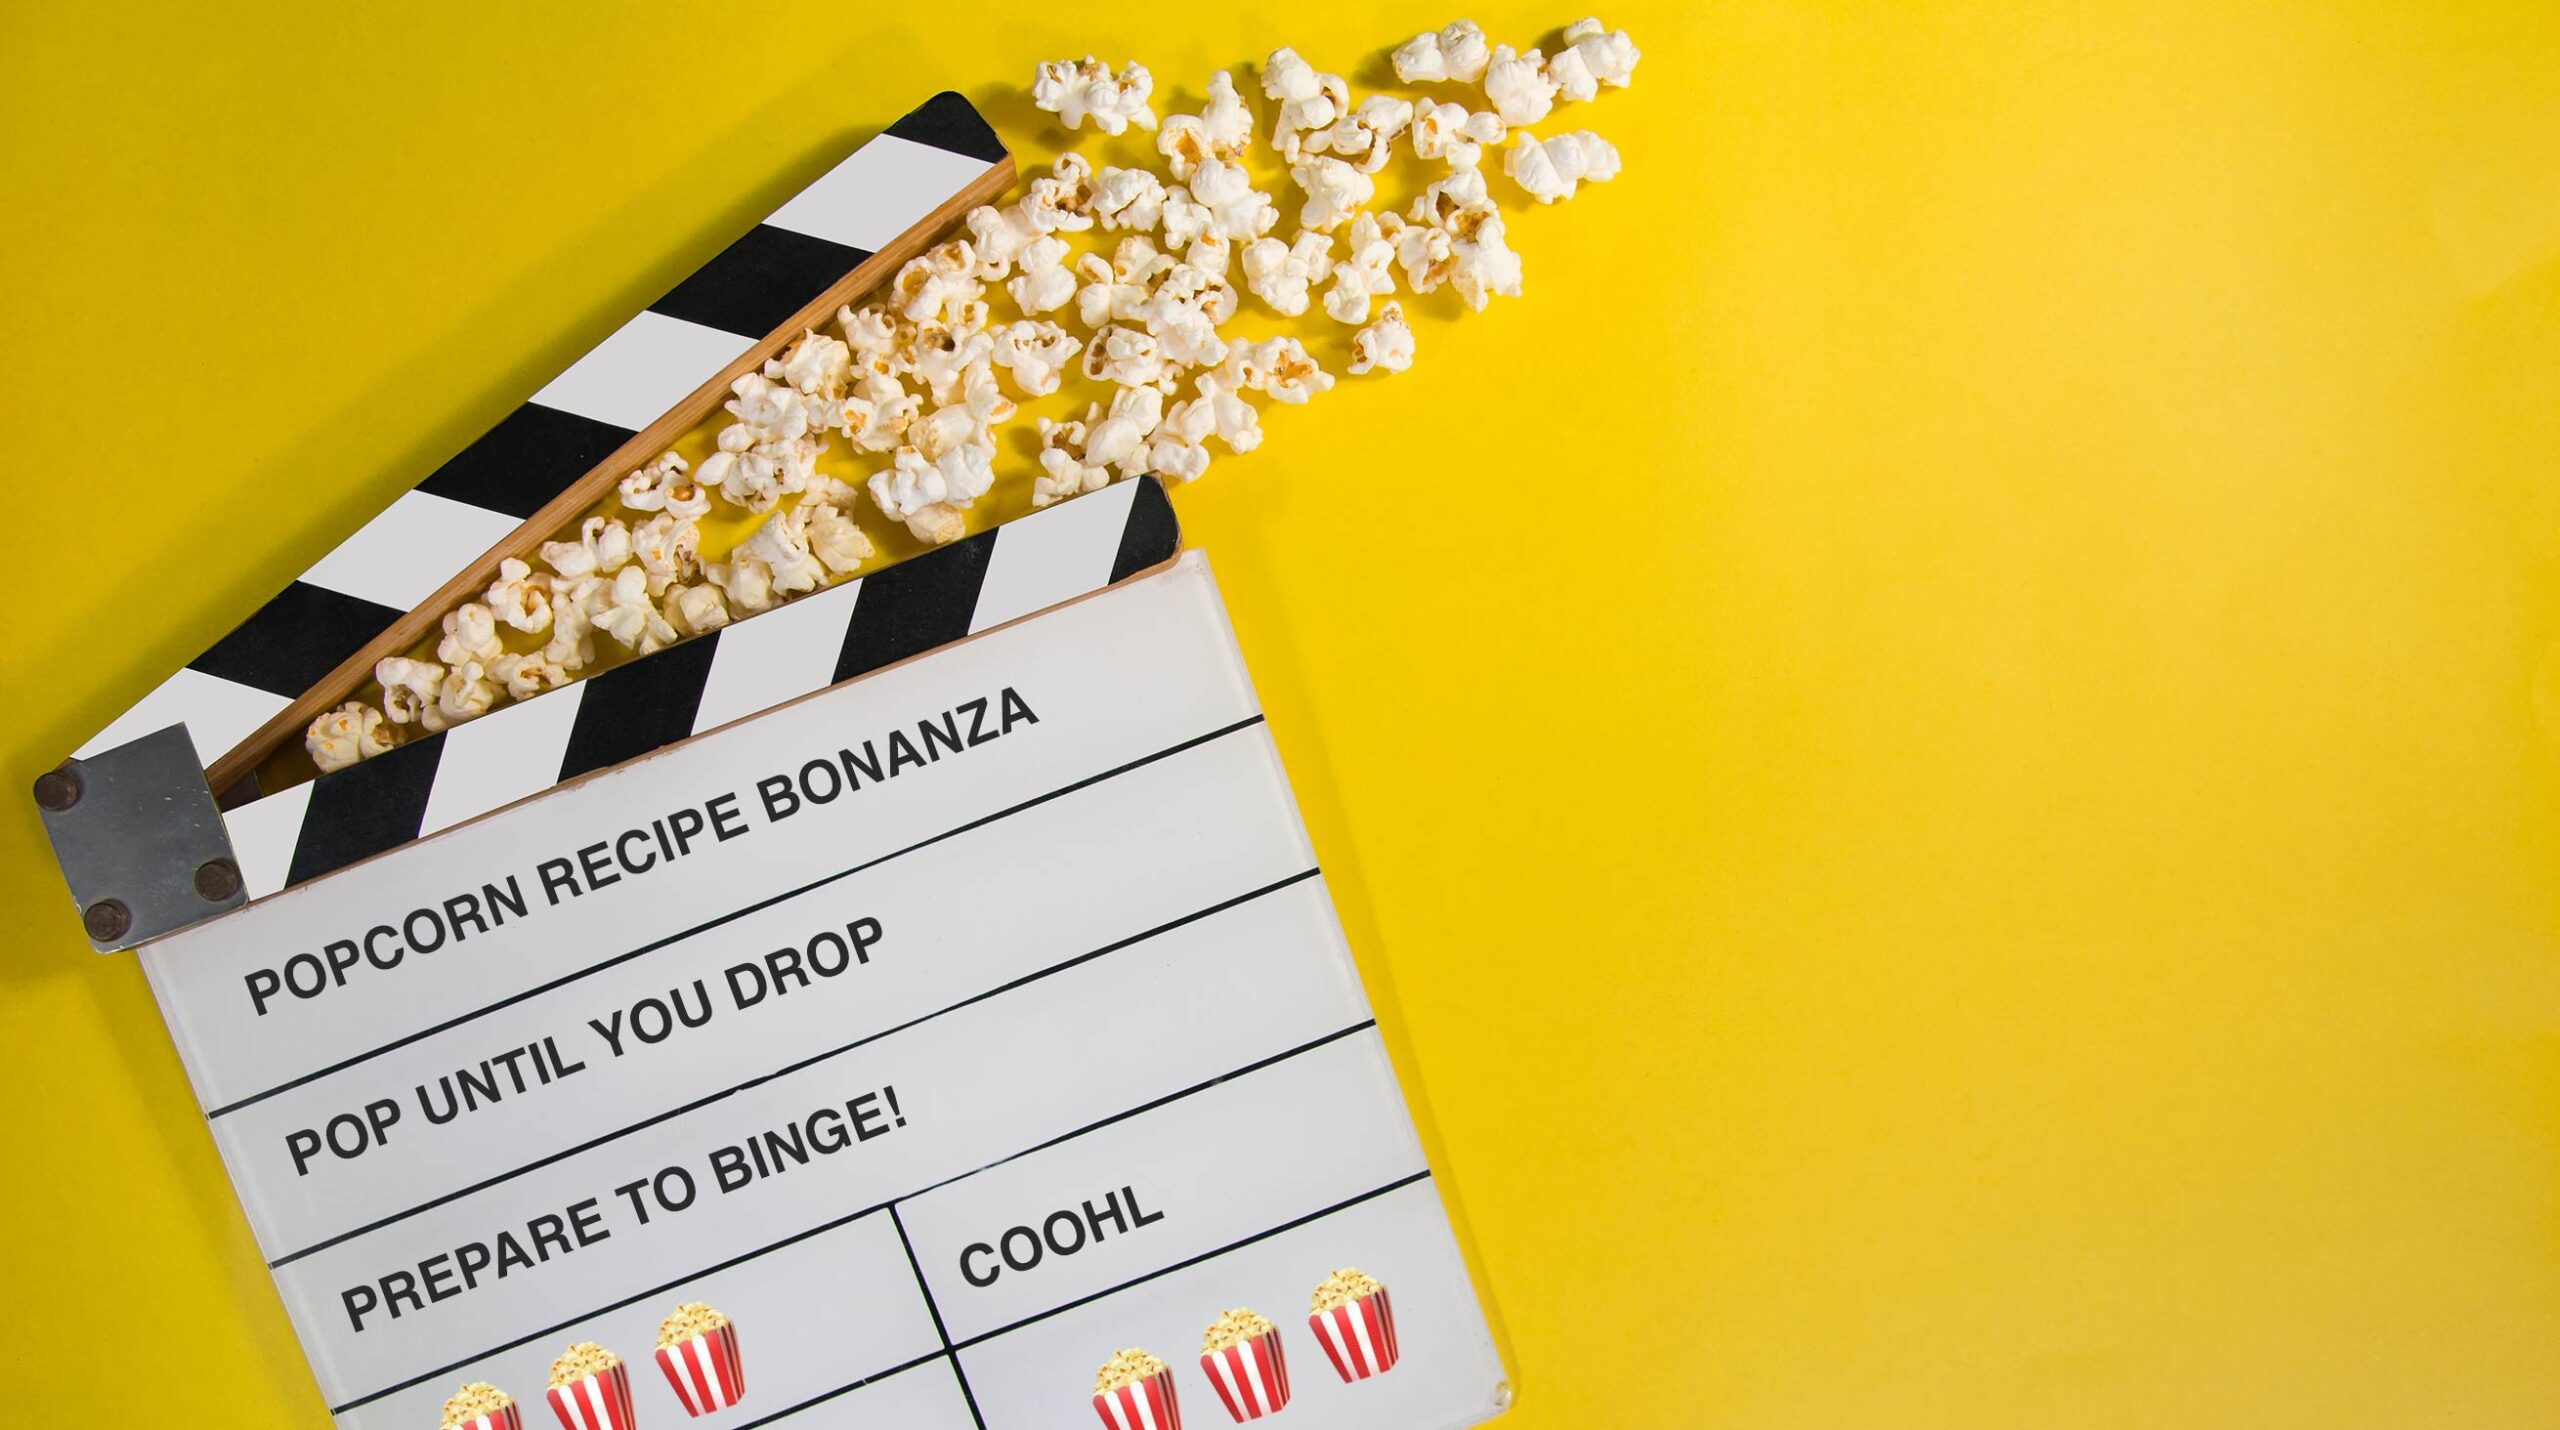 Popcornrecept Bonanza!